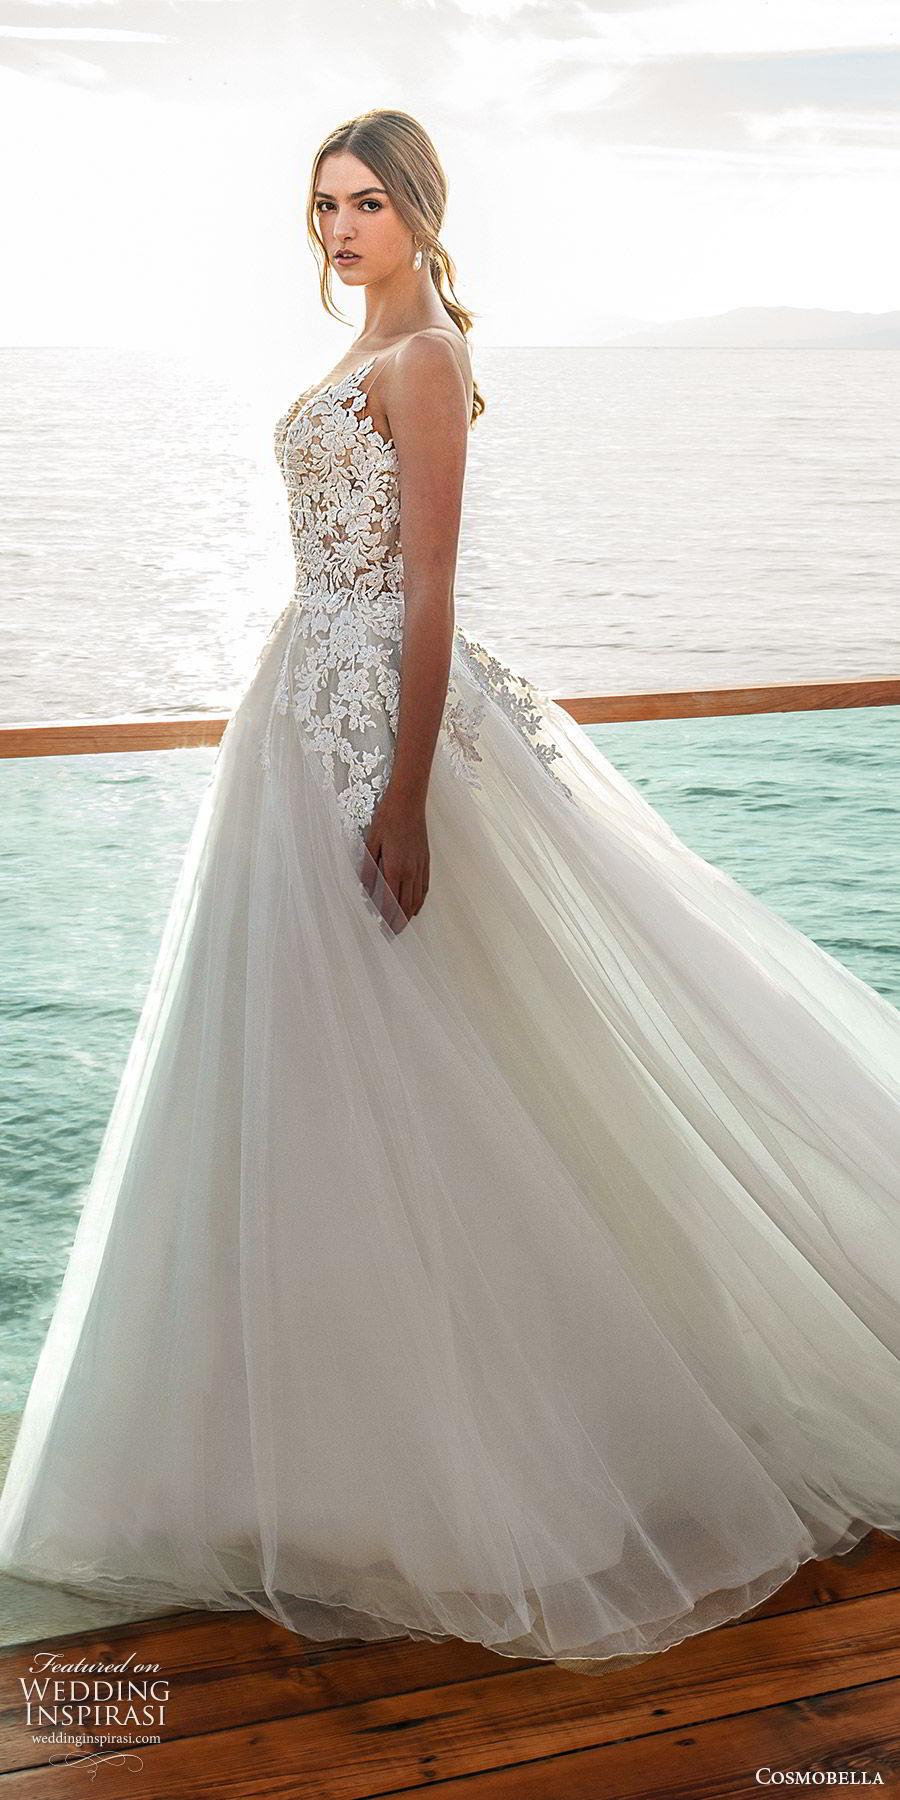 cosmobella 2020 bridal sleeveless illusion bateau neckline sweetheart embellished bodice a line ball gown wedding dress (15) romantic princess chapel train sv